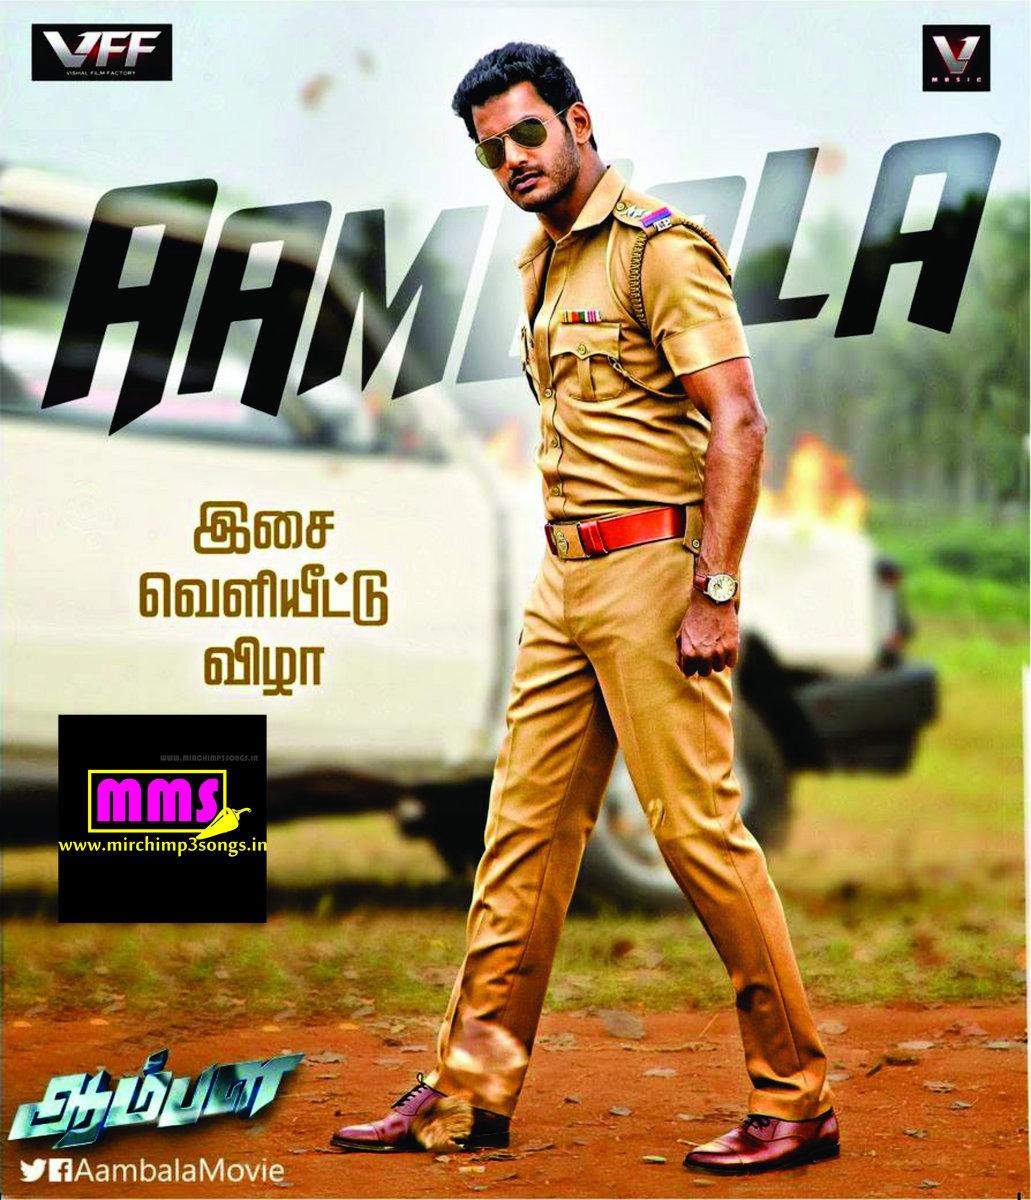 3 Movie Mp3 Songs Free Download In Hindi Krispavechyba